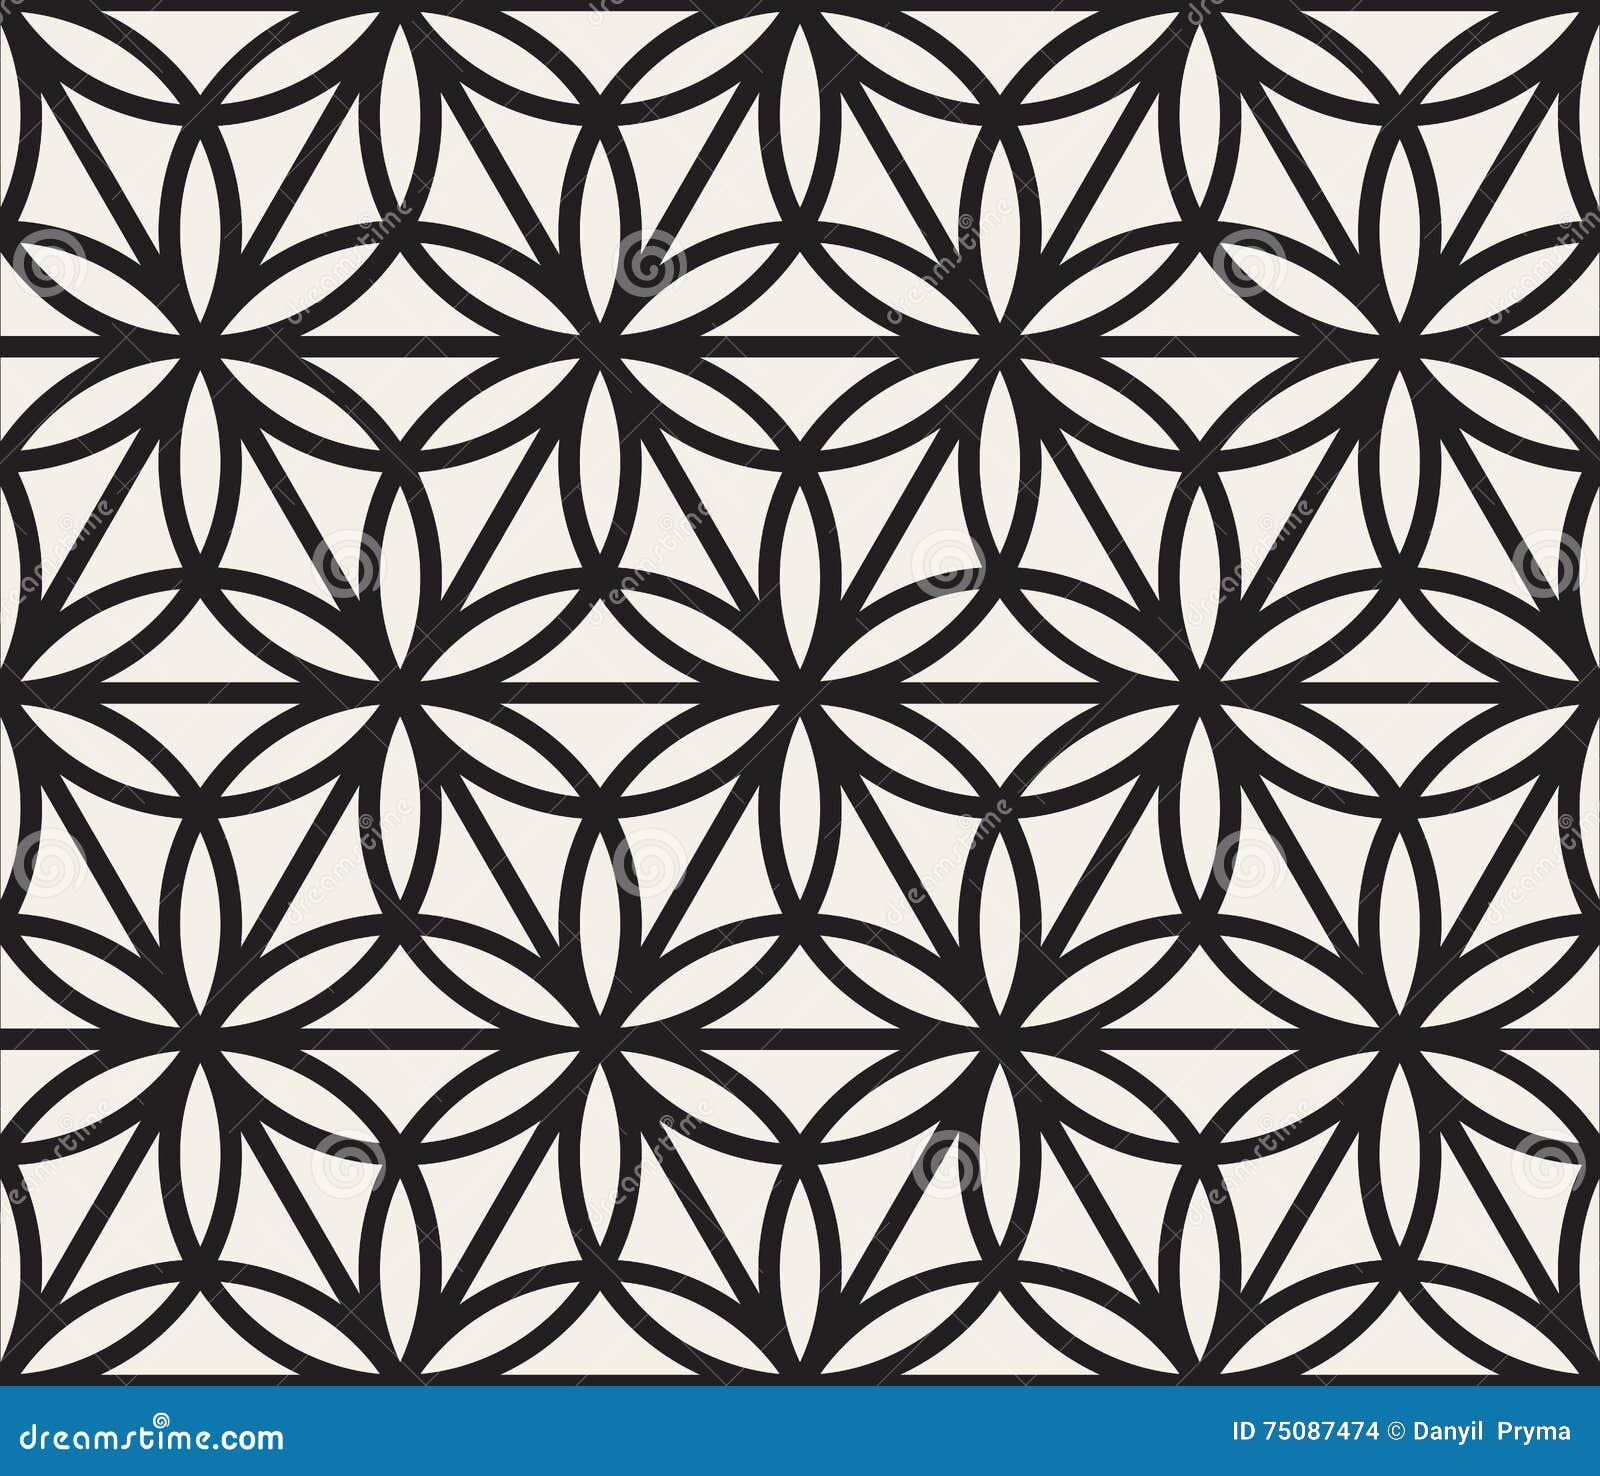 vector seamless black and white geometric circle triangle